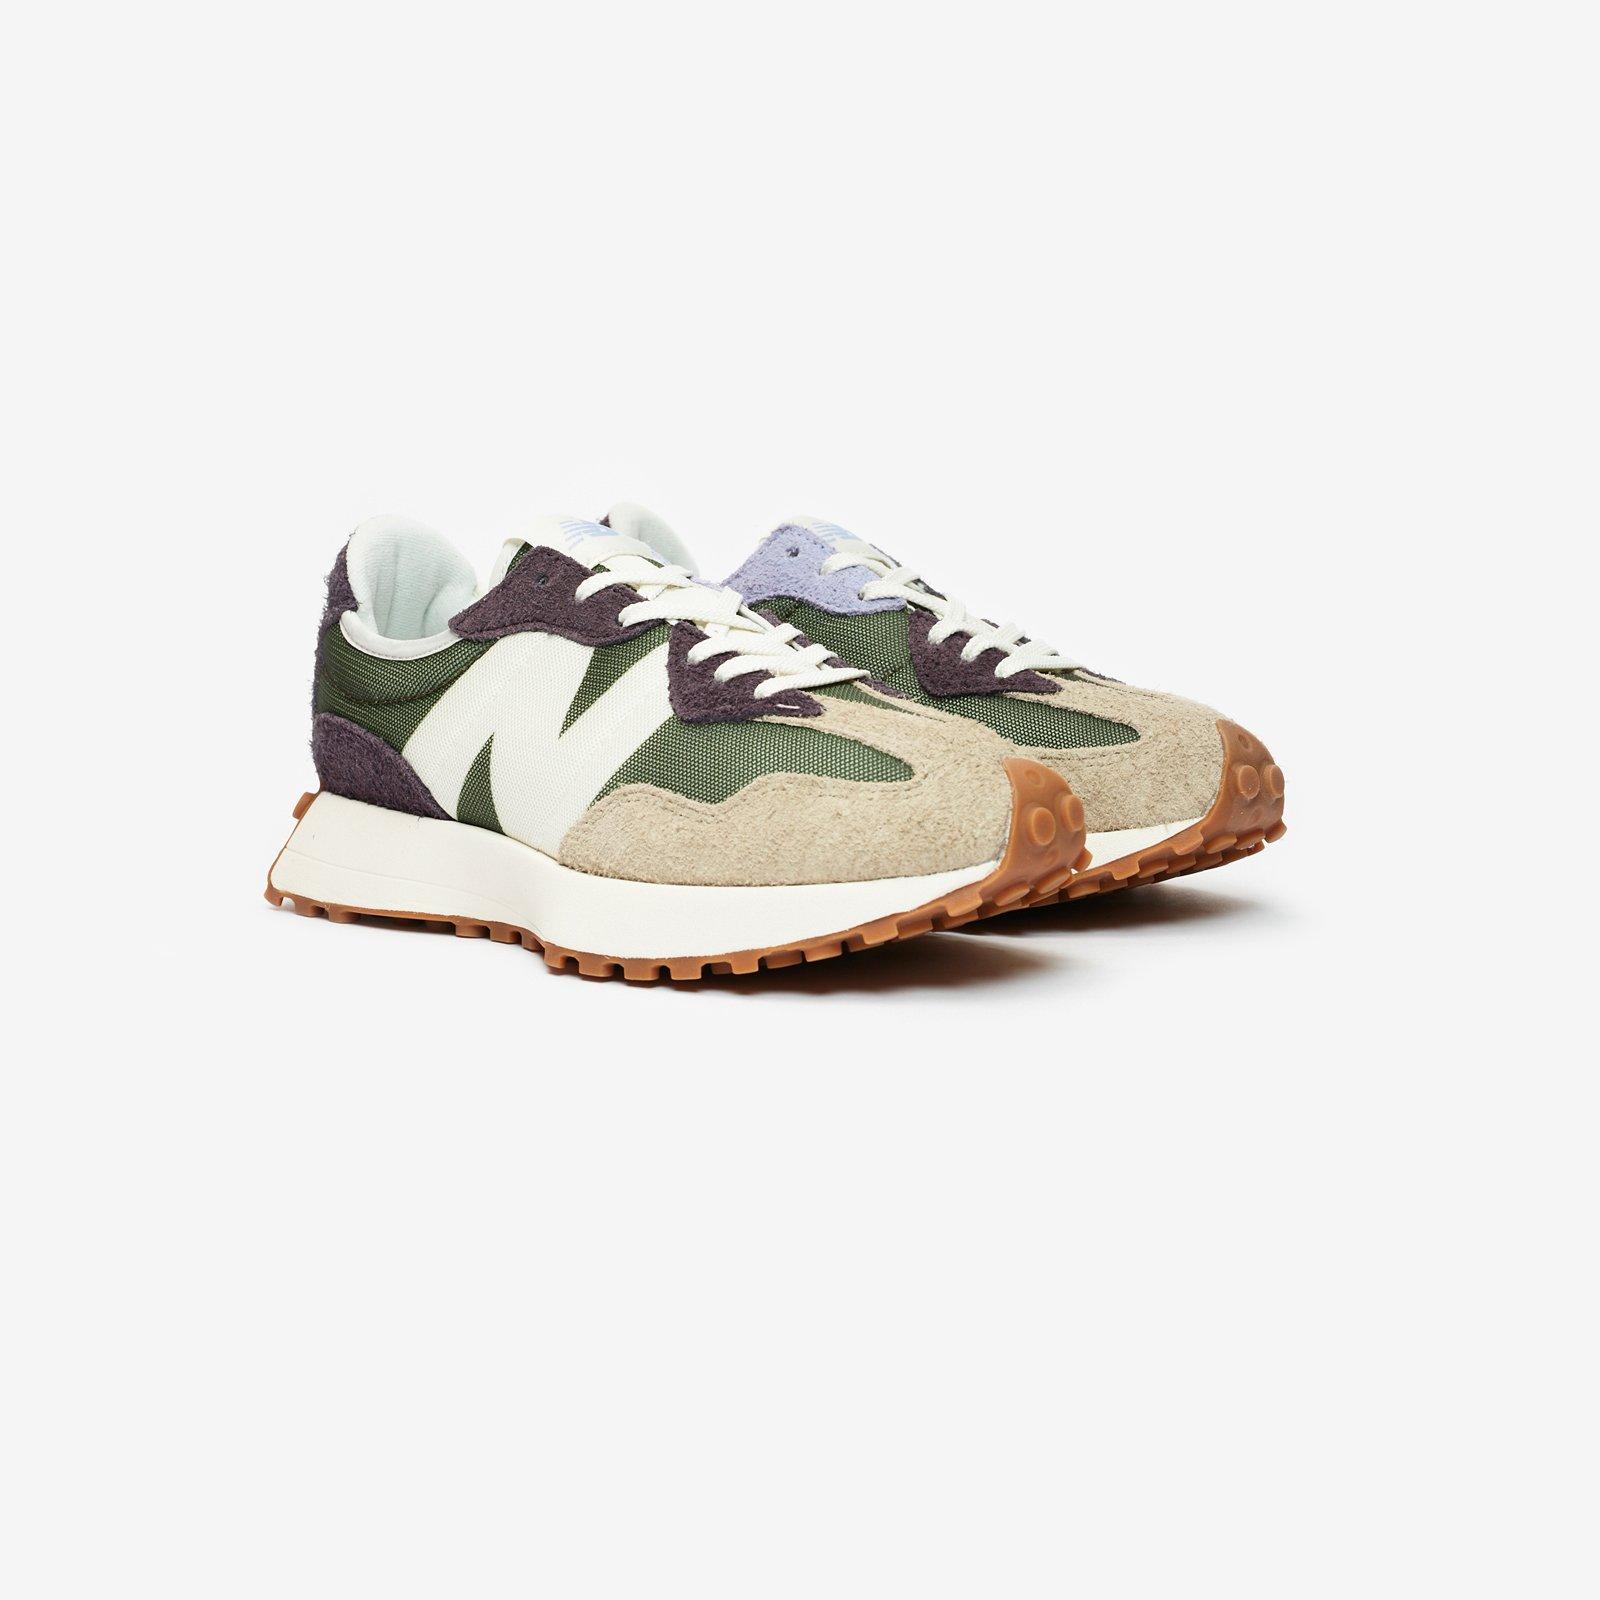 New Balance WS327 - Ws327cob - SNS | sneakers & streetwear en ...